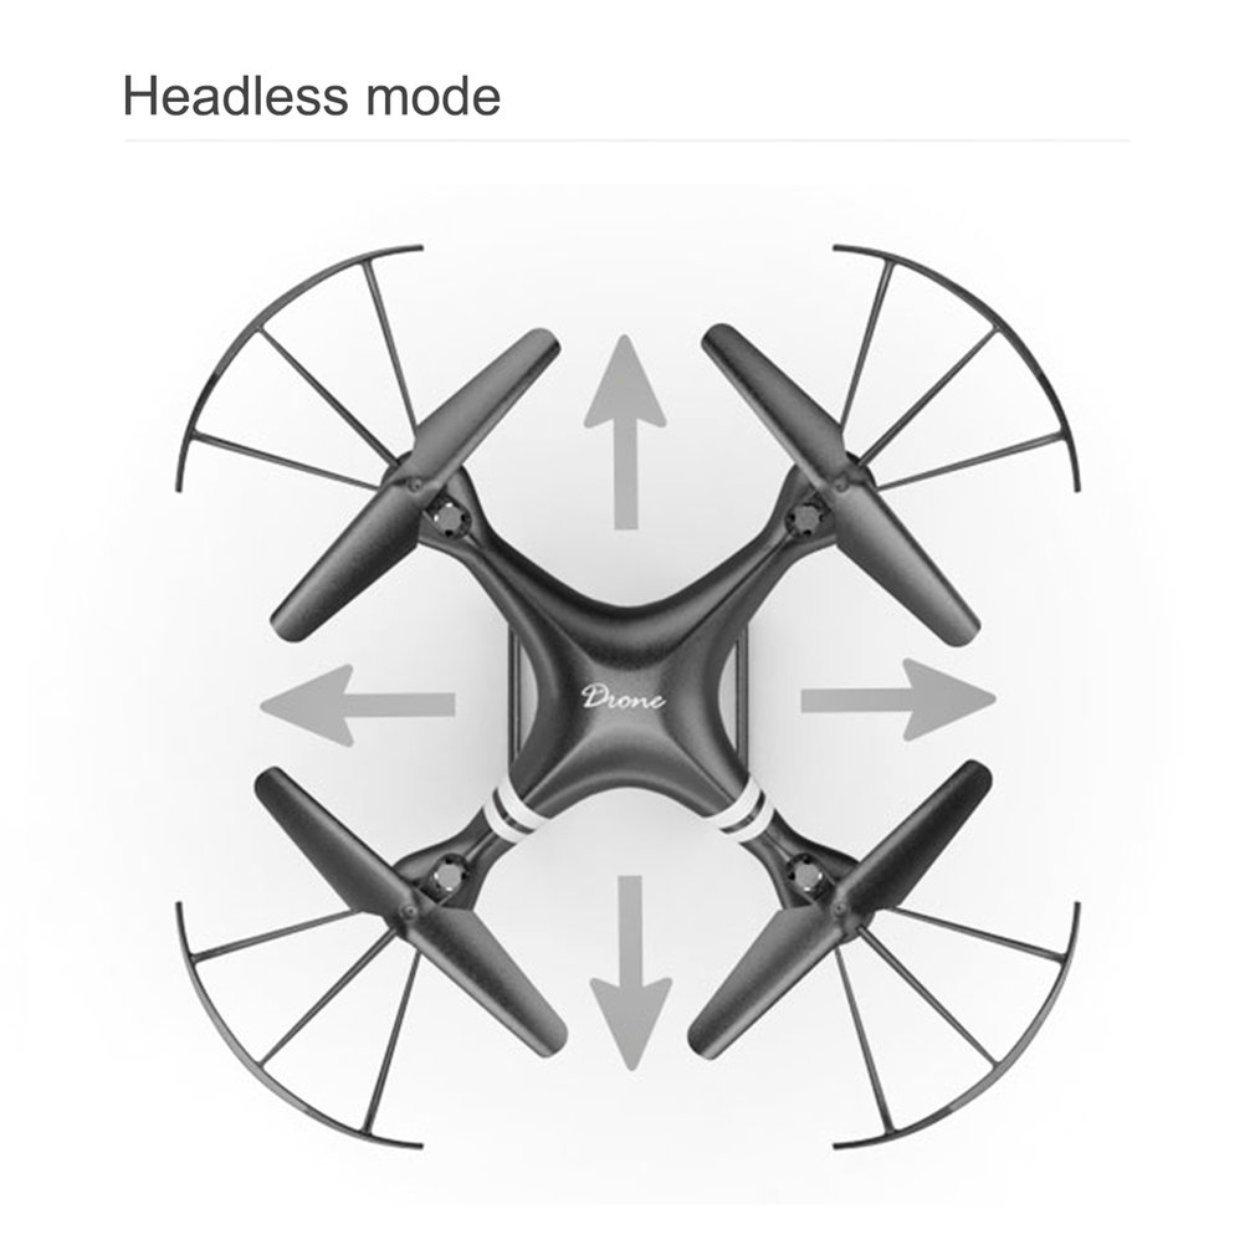 Dailyinshop Lente Gran Angular 0.3MP FPV Cámara Quadcopter RC 2.4GHz Drone WiFi FPV 0.3MP Helicóptero (Color: Negro) c67c14